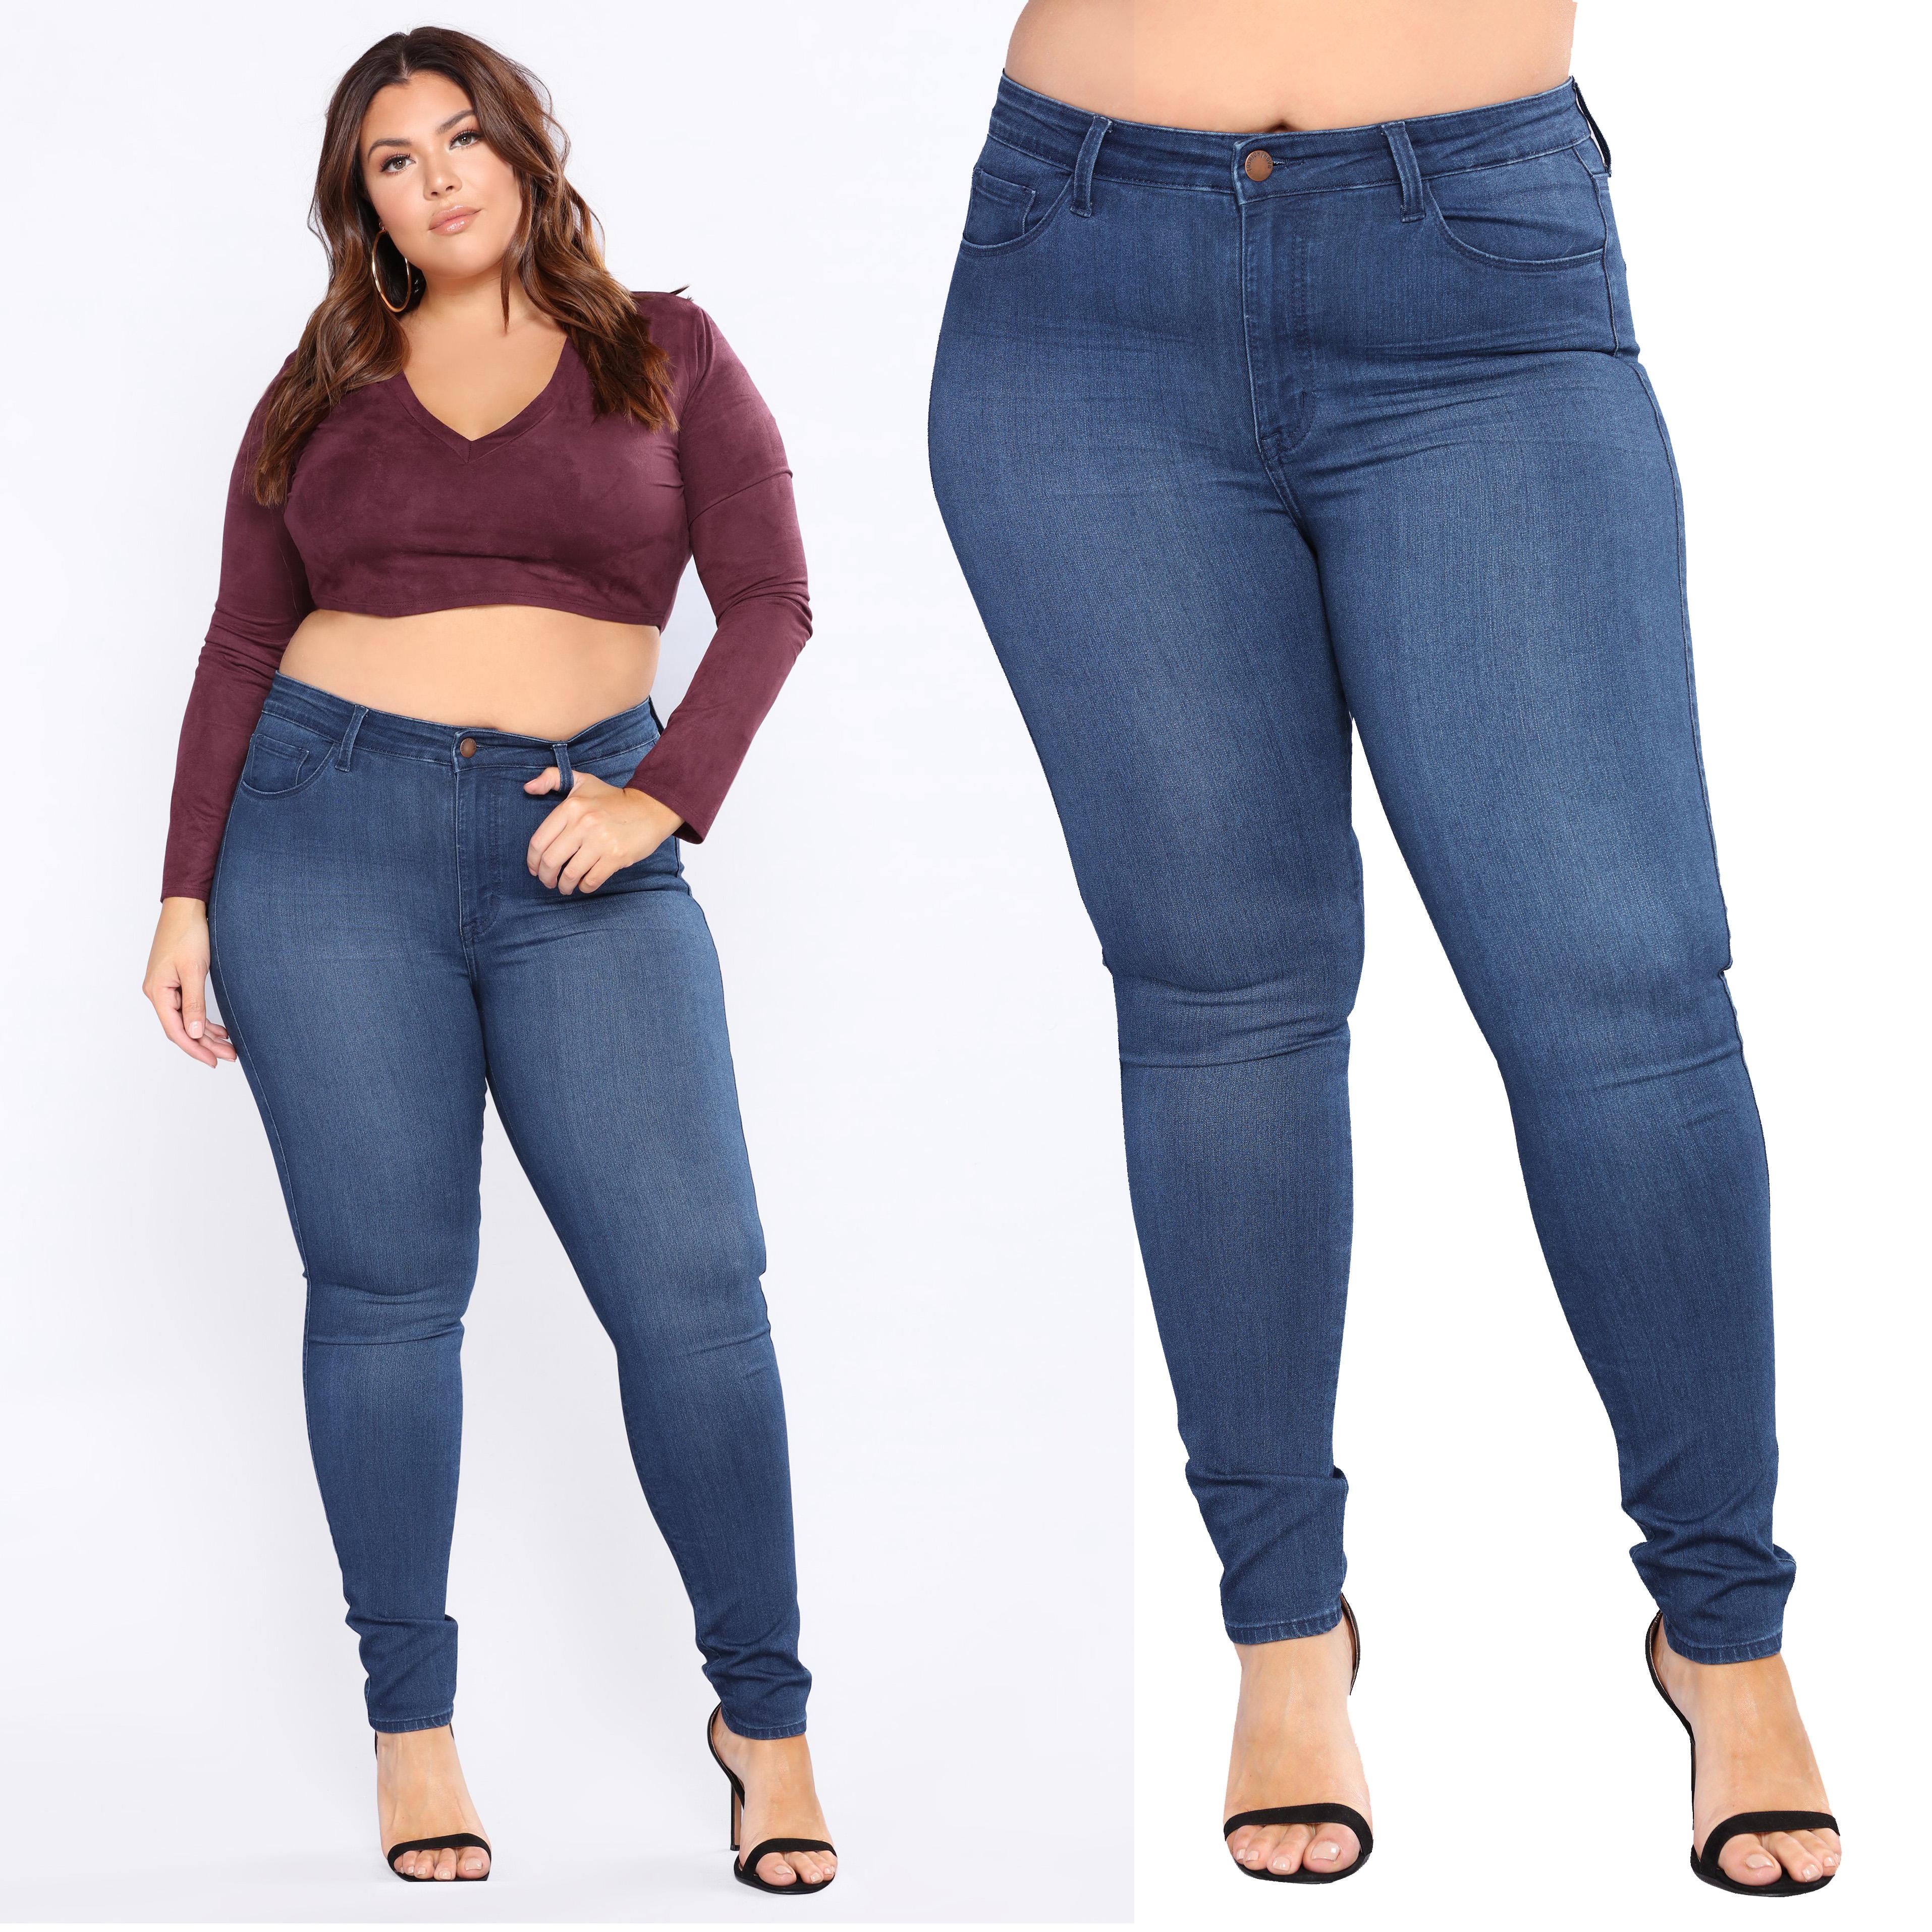 Skinny Tight Plus Size High Waist Stretch Denim Wide Sexy Hips Girls Jeans  - Buy Sexy Skinny Girls Tight Jeans,Wide Sexy Hips,Plus Size Stretch Jeans  Product on Alibaba.com